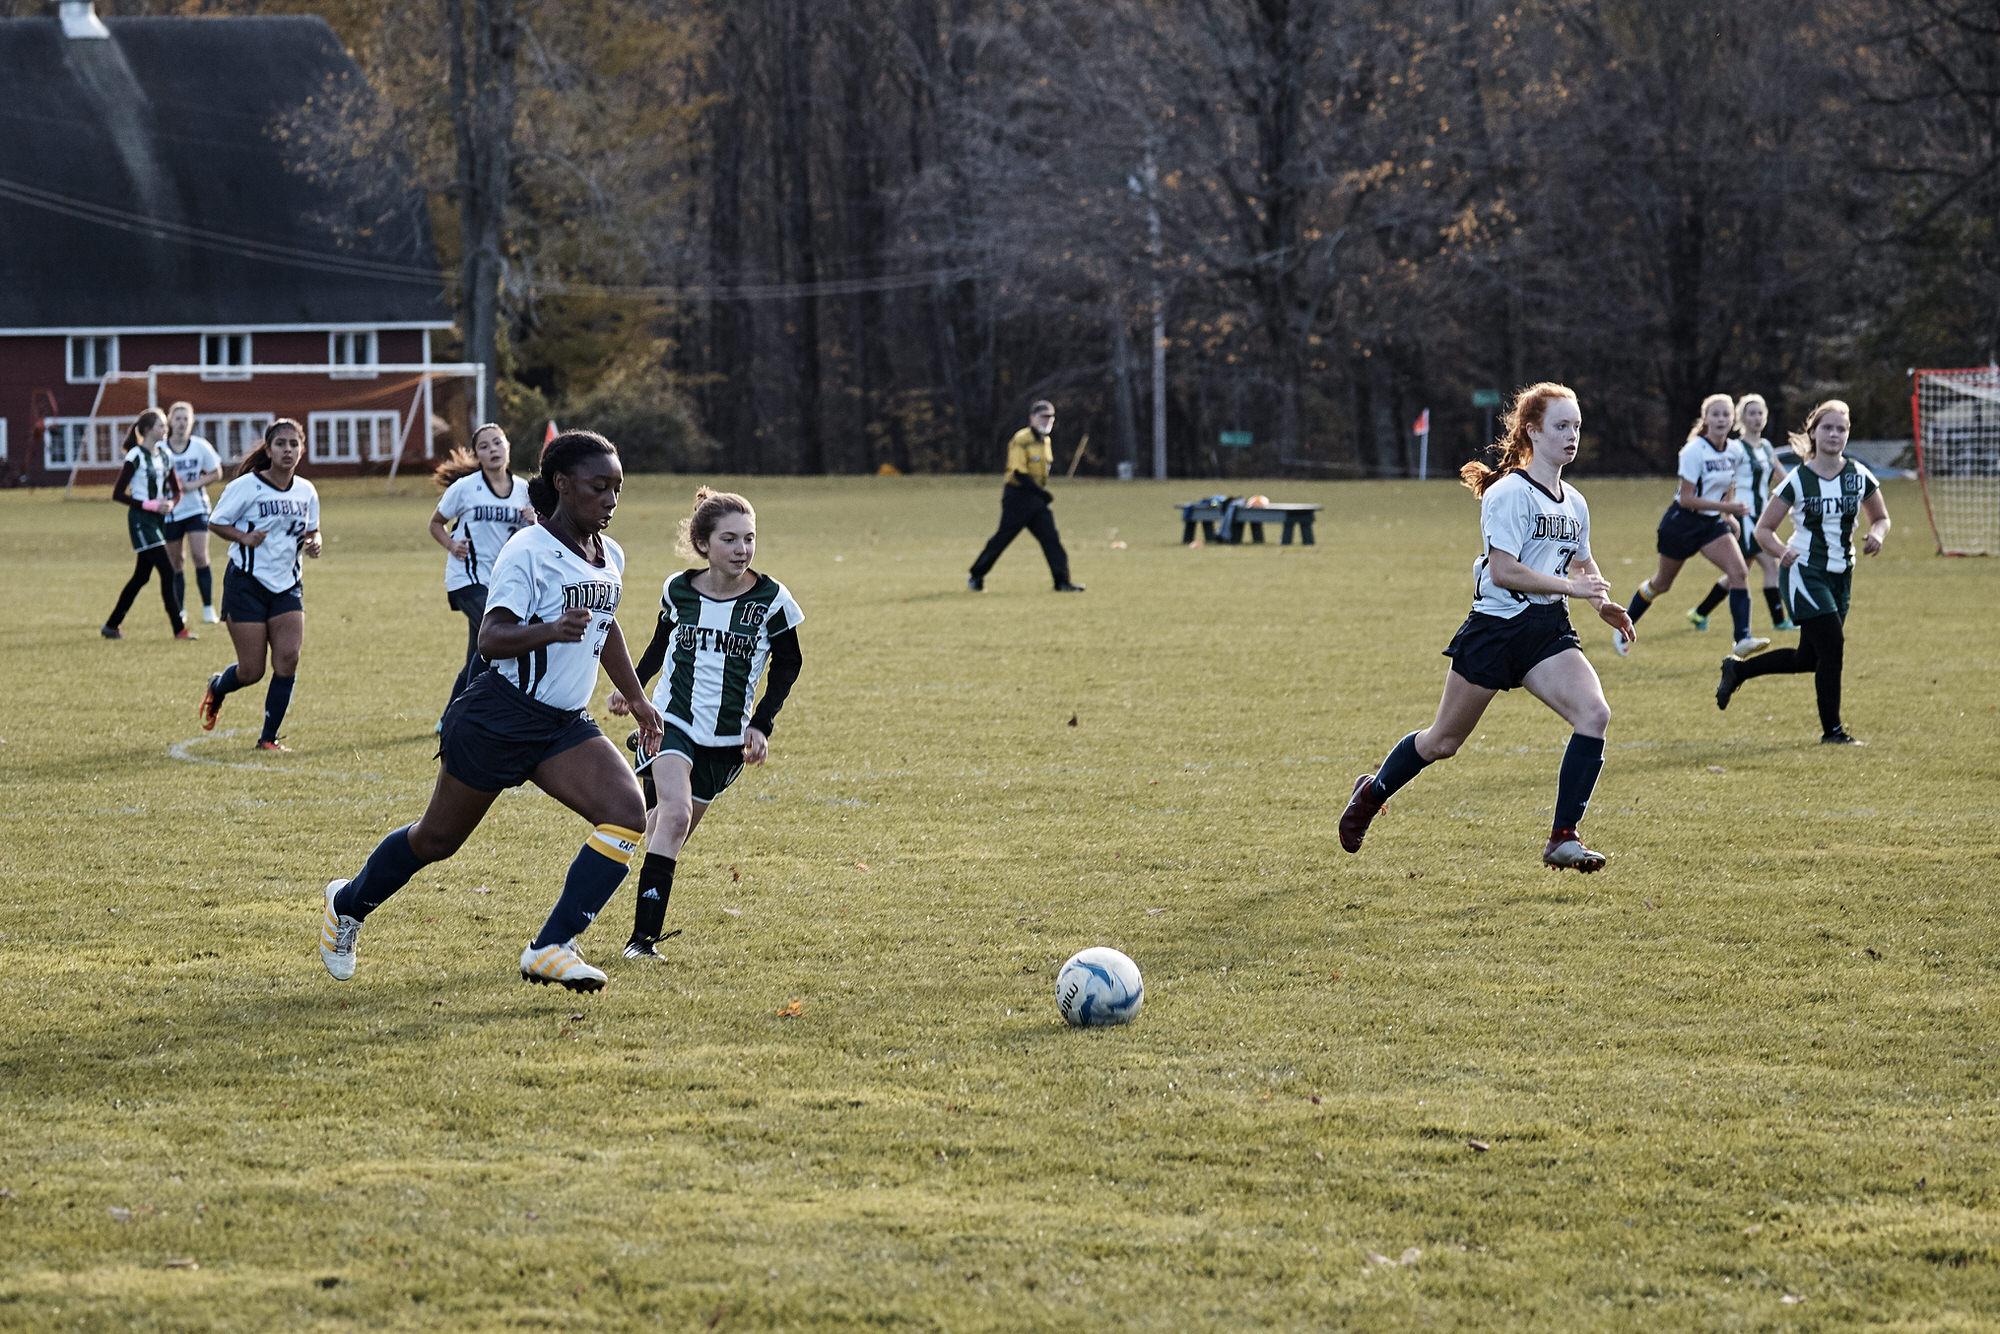 Girls Varsity Soccer vs. Putney School - October 26, 2018 - 037.jpg